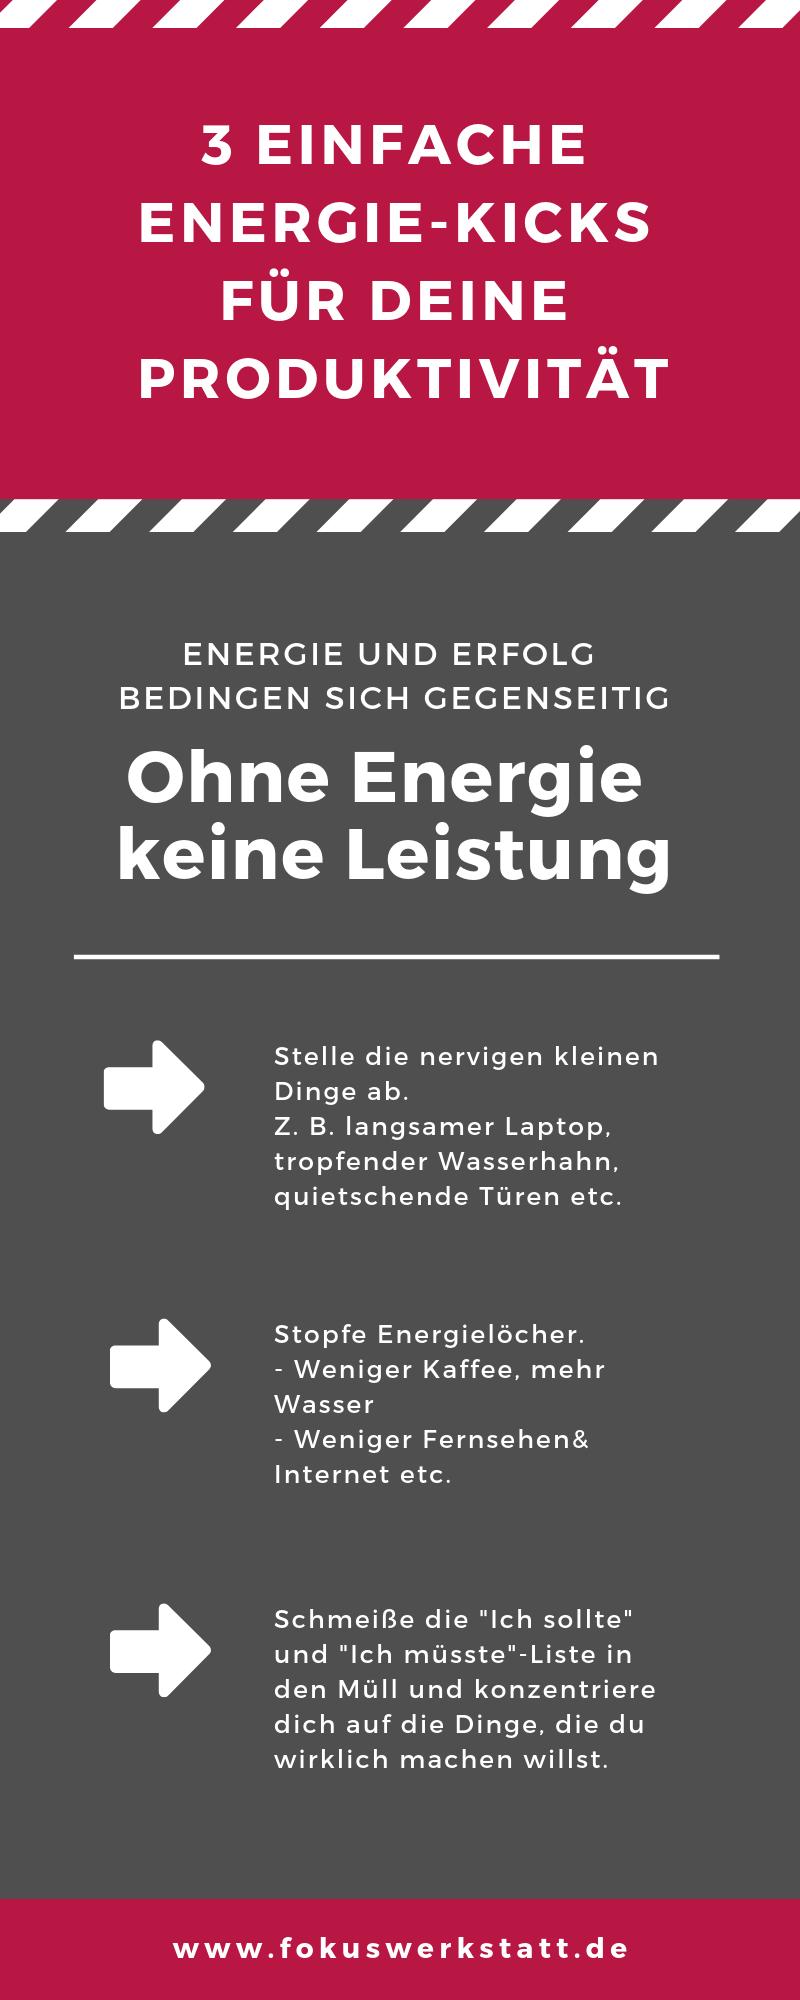 3 energie-kicks